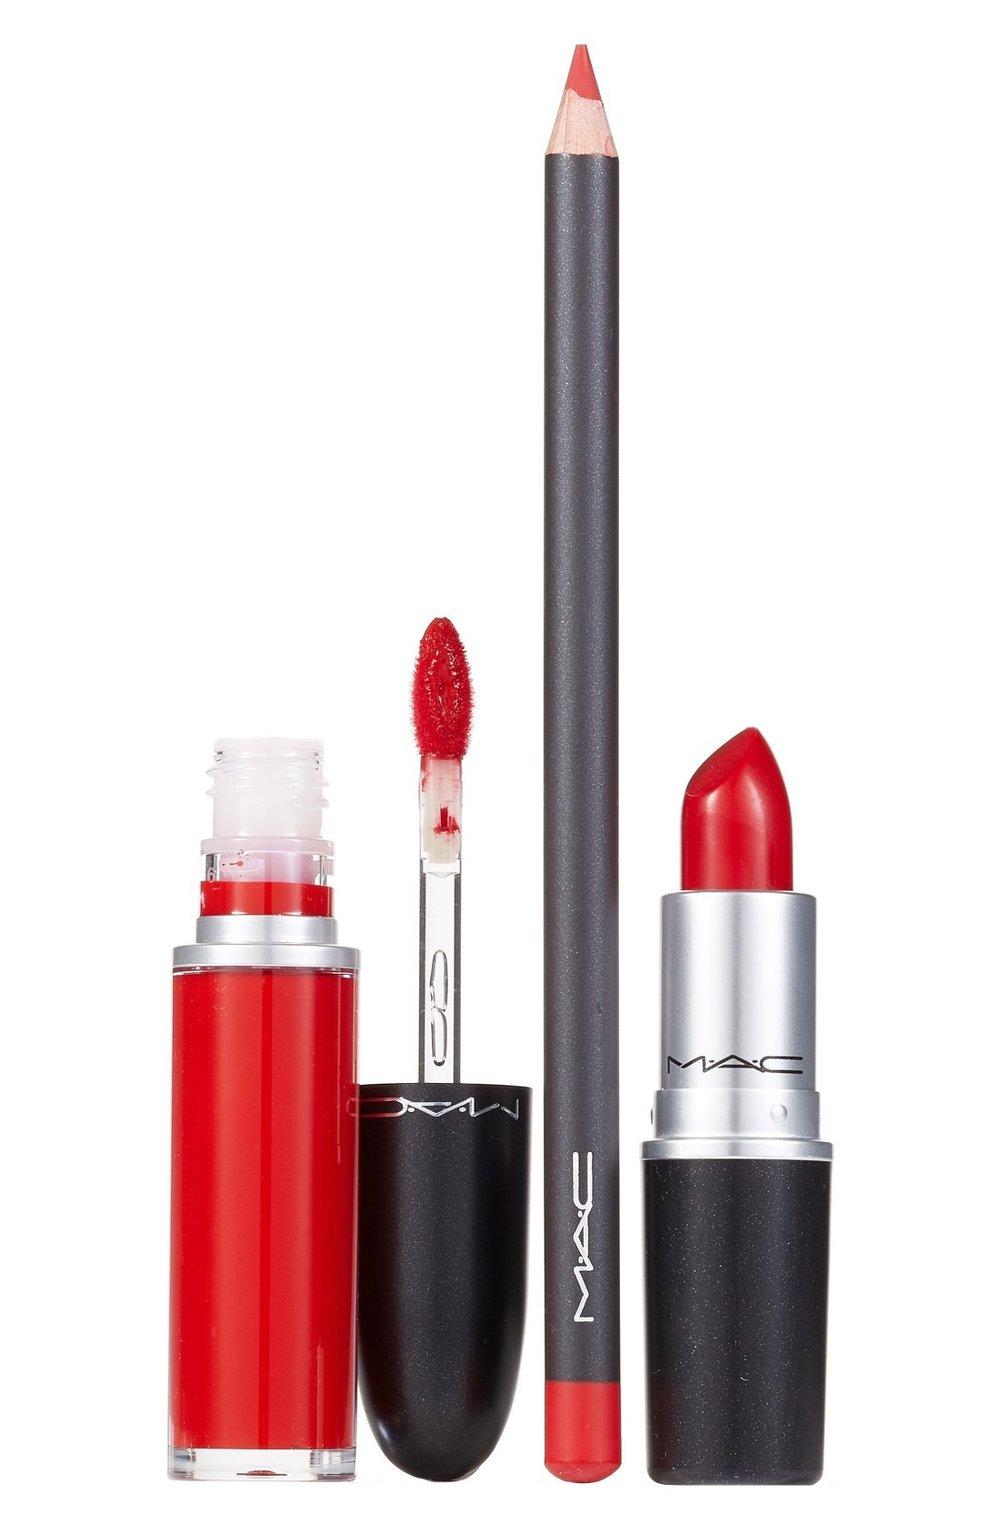 Lippencil, gloss & lipstick by M.A.C. Cosmetics